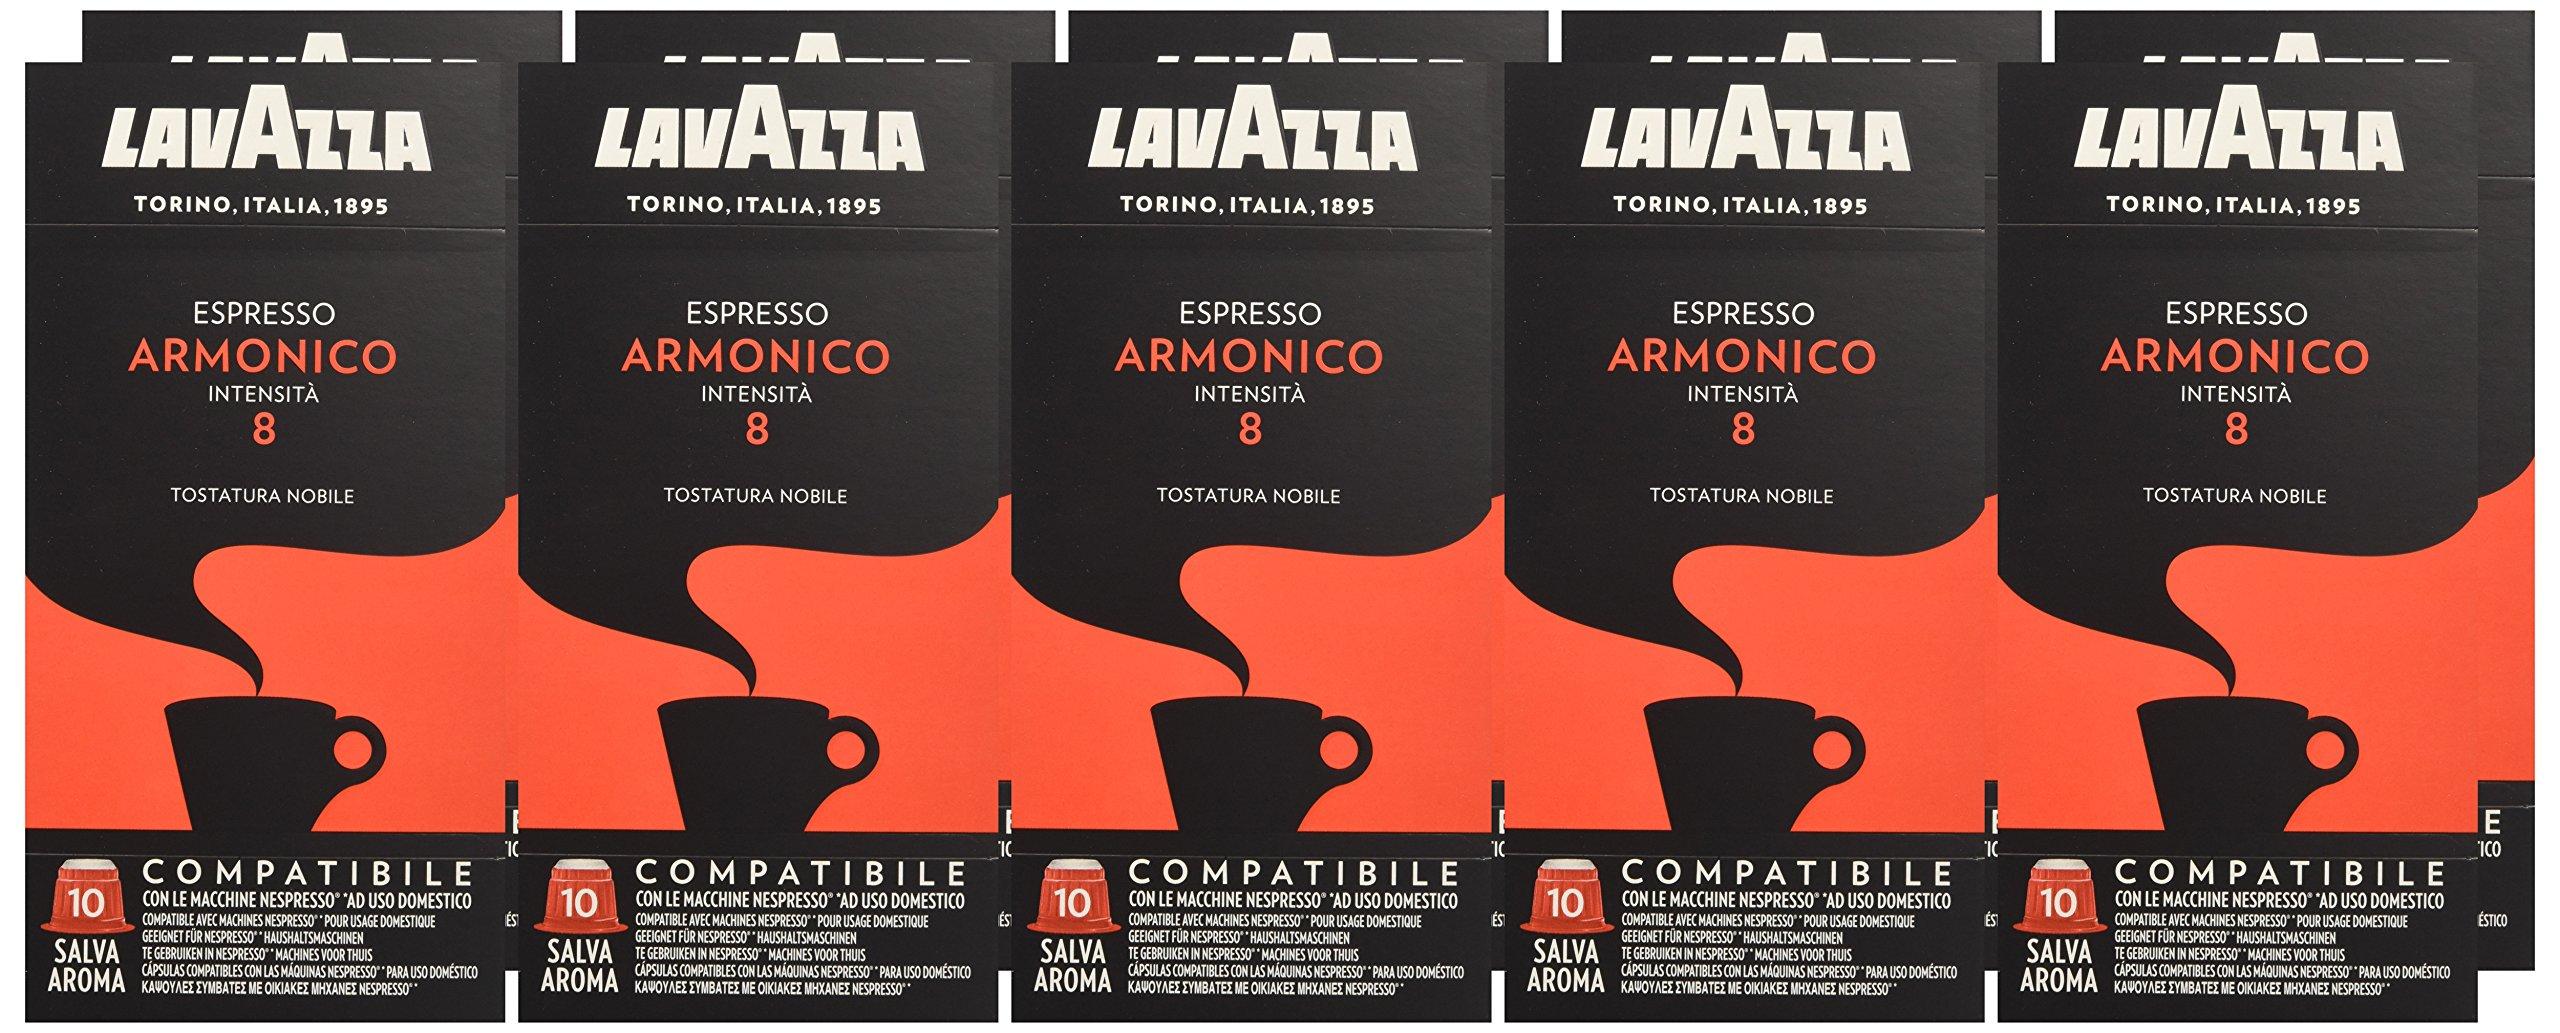 Lavazza Capsule Compatibili Nespresso 6 spesavip